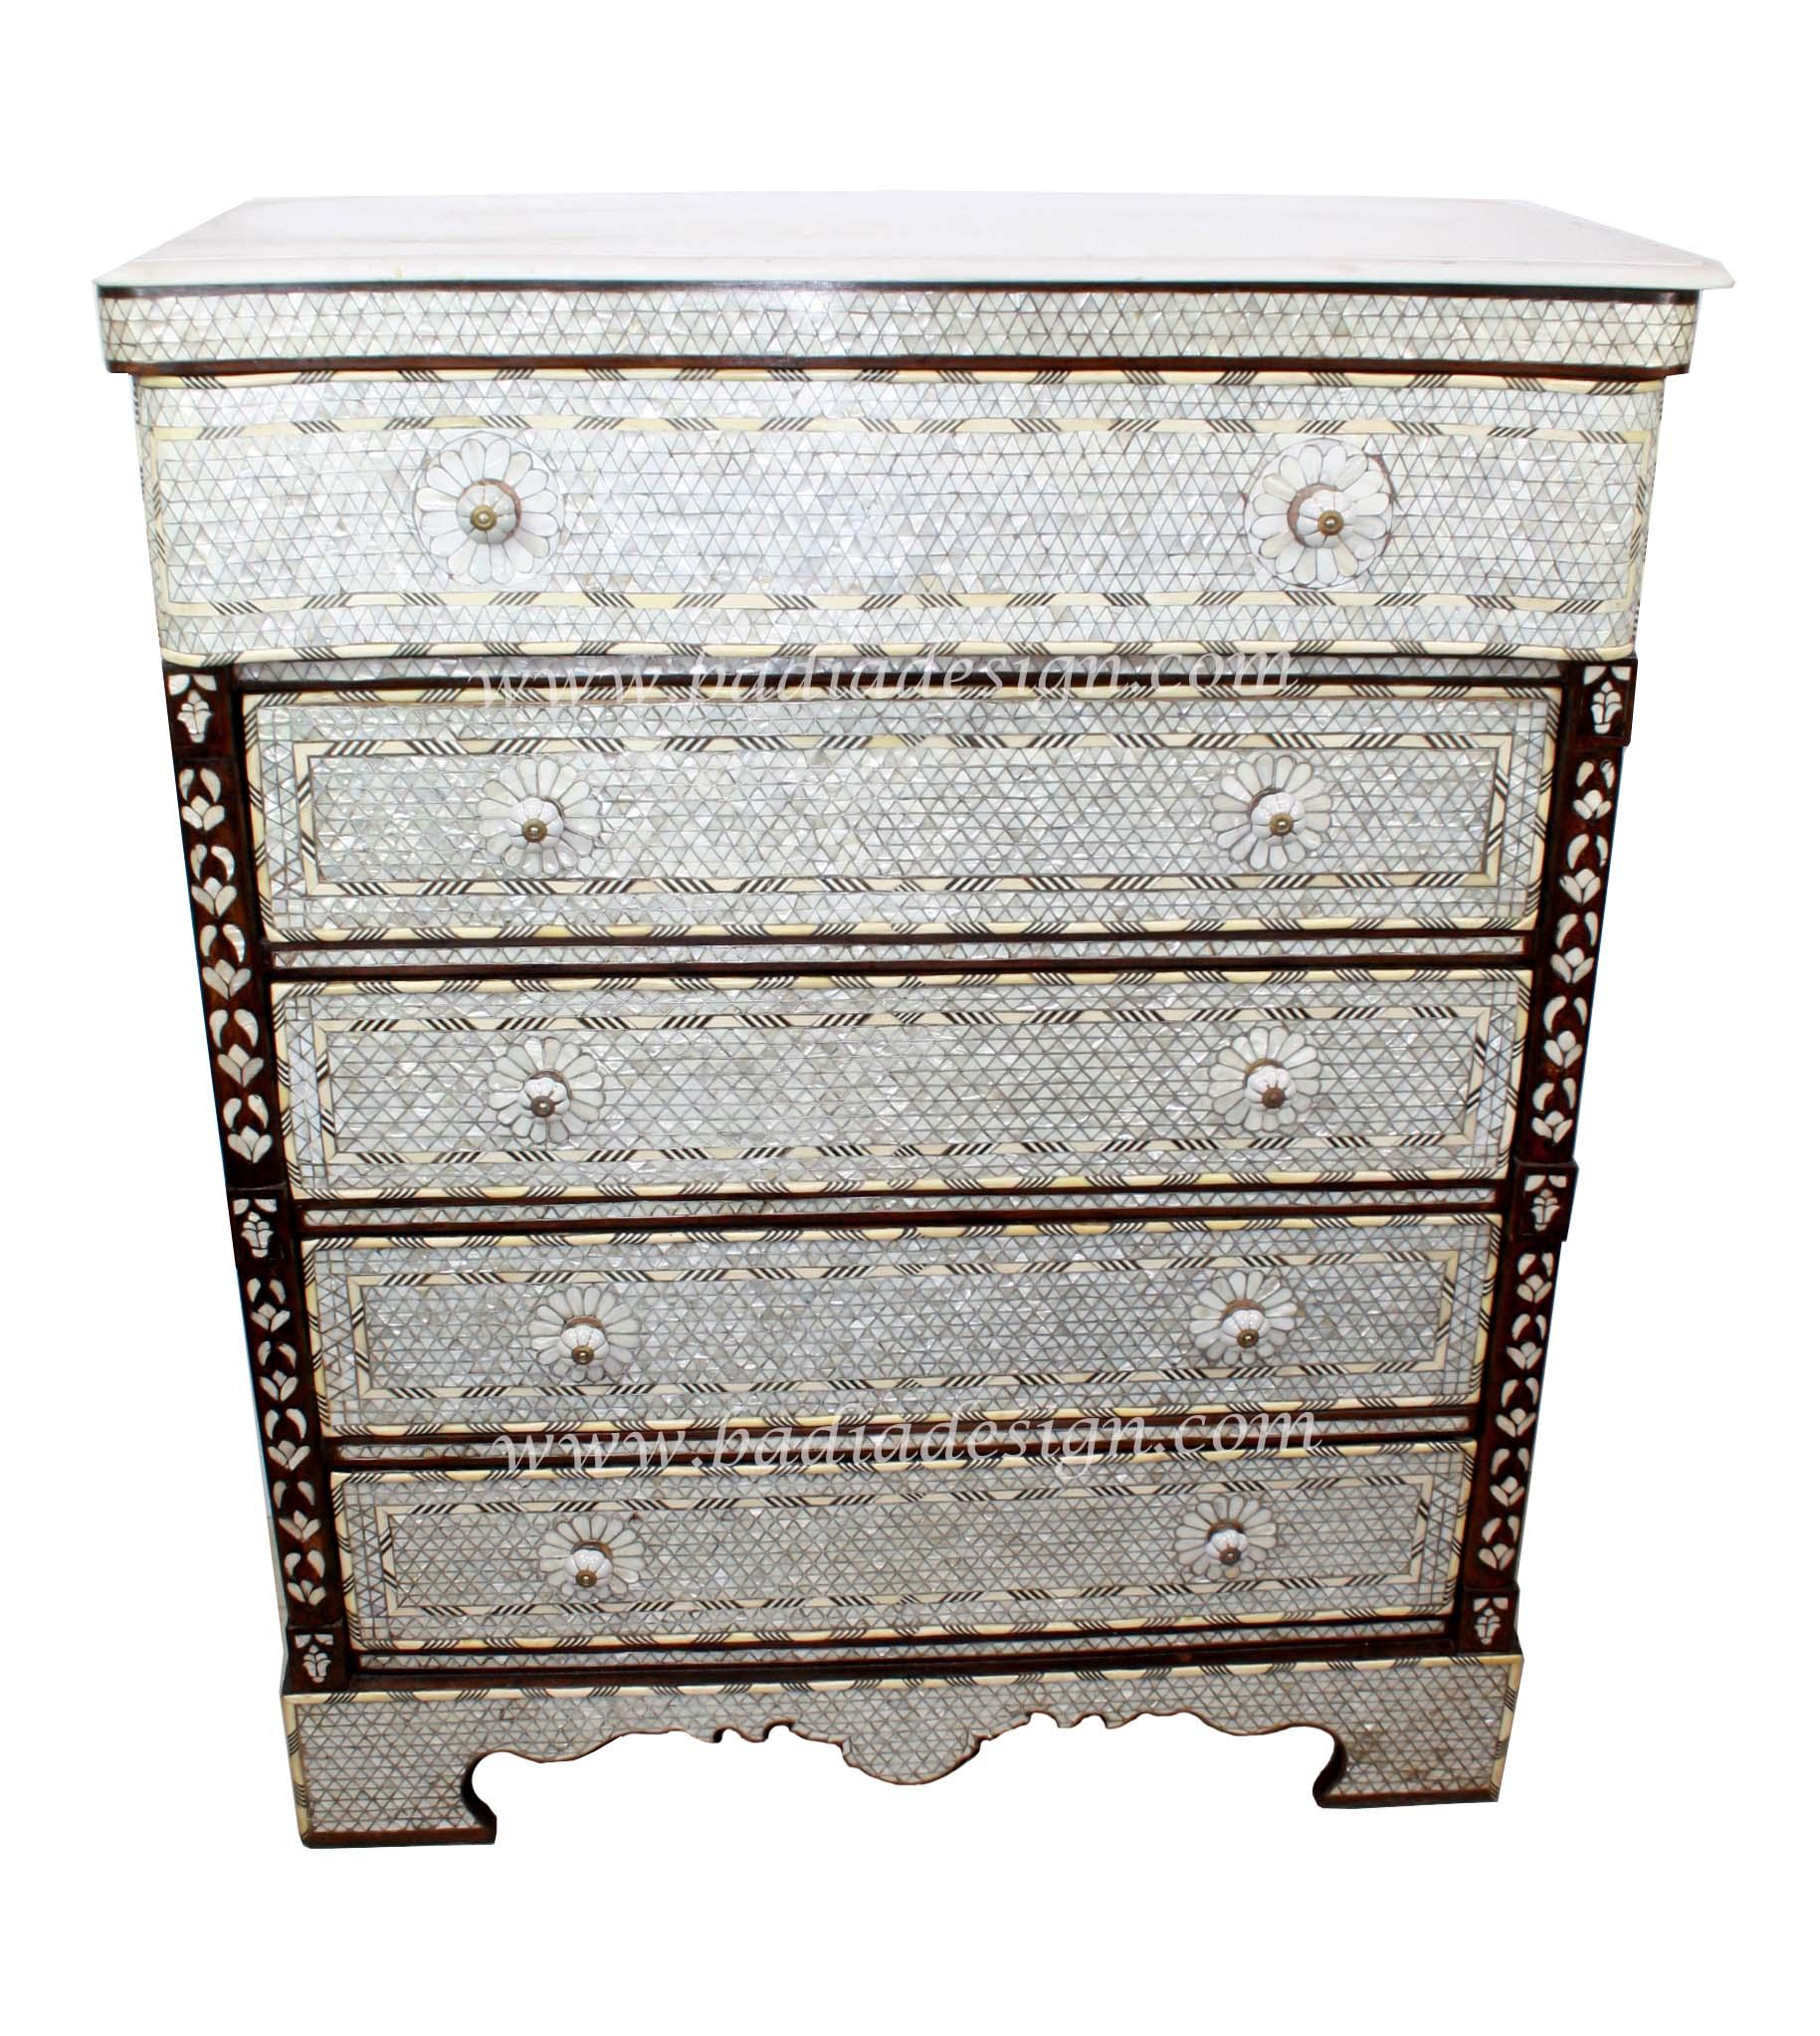 mother-of-pearl-dresser-mop-dr054-1.jpg